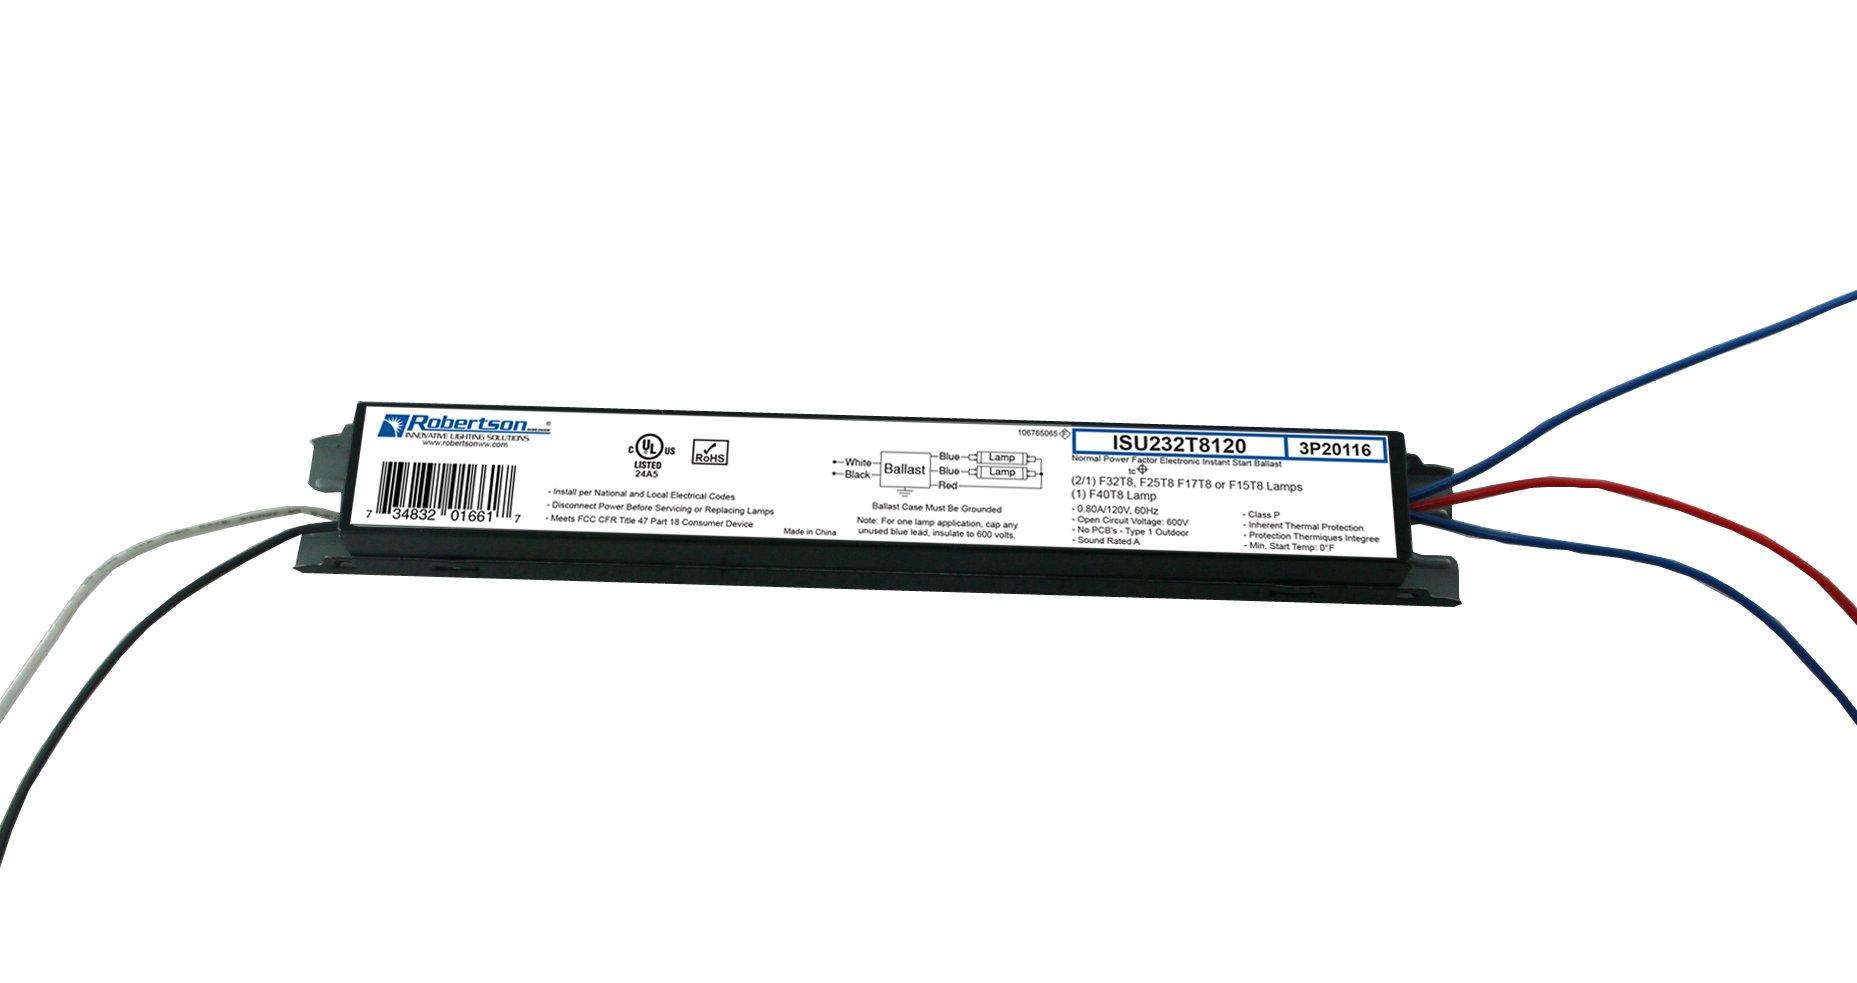 ROBERTSON 3P20116 eBallast, Instant Start, NPF, 1 or 2 Lamp F32T8, 120Vac, 60 Hz, Model ISU232T8120 BA (Replaces Robertson 3P20003, Model ISU232T8120/B)